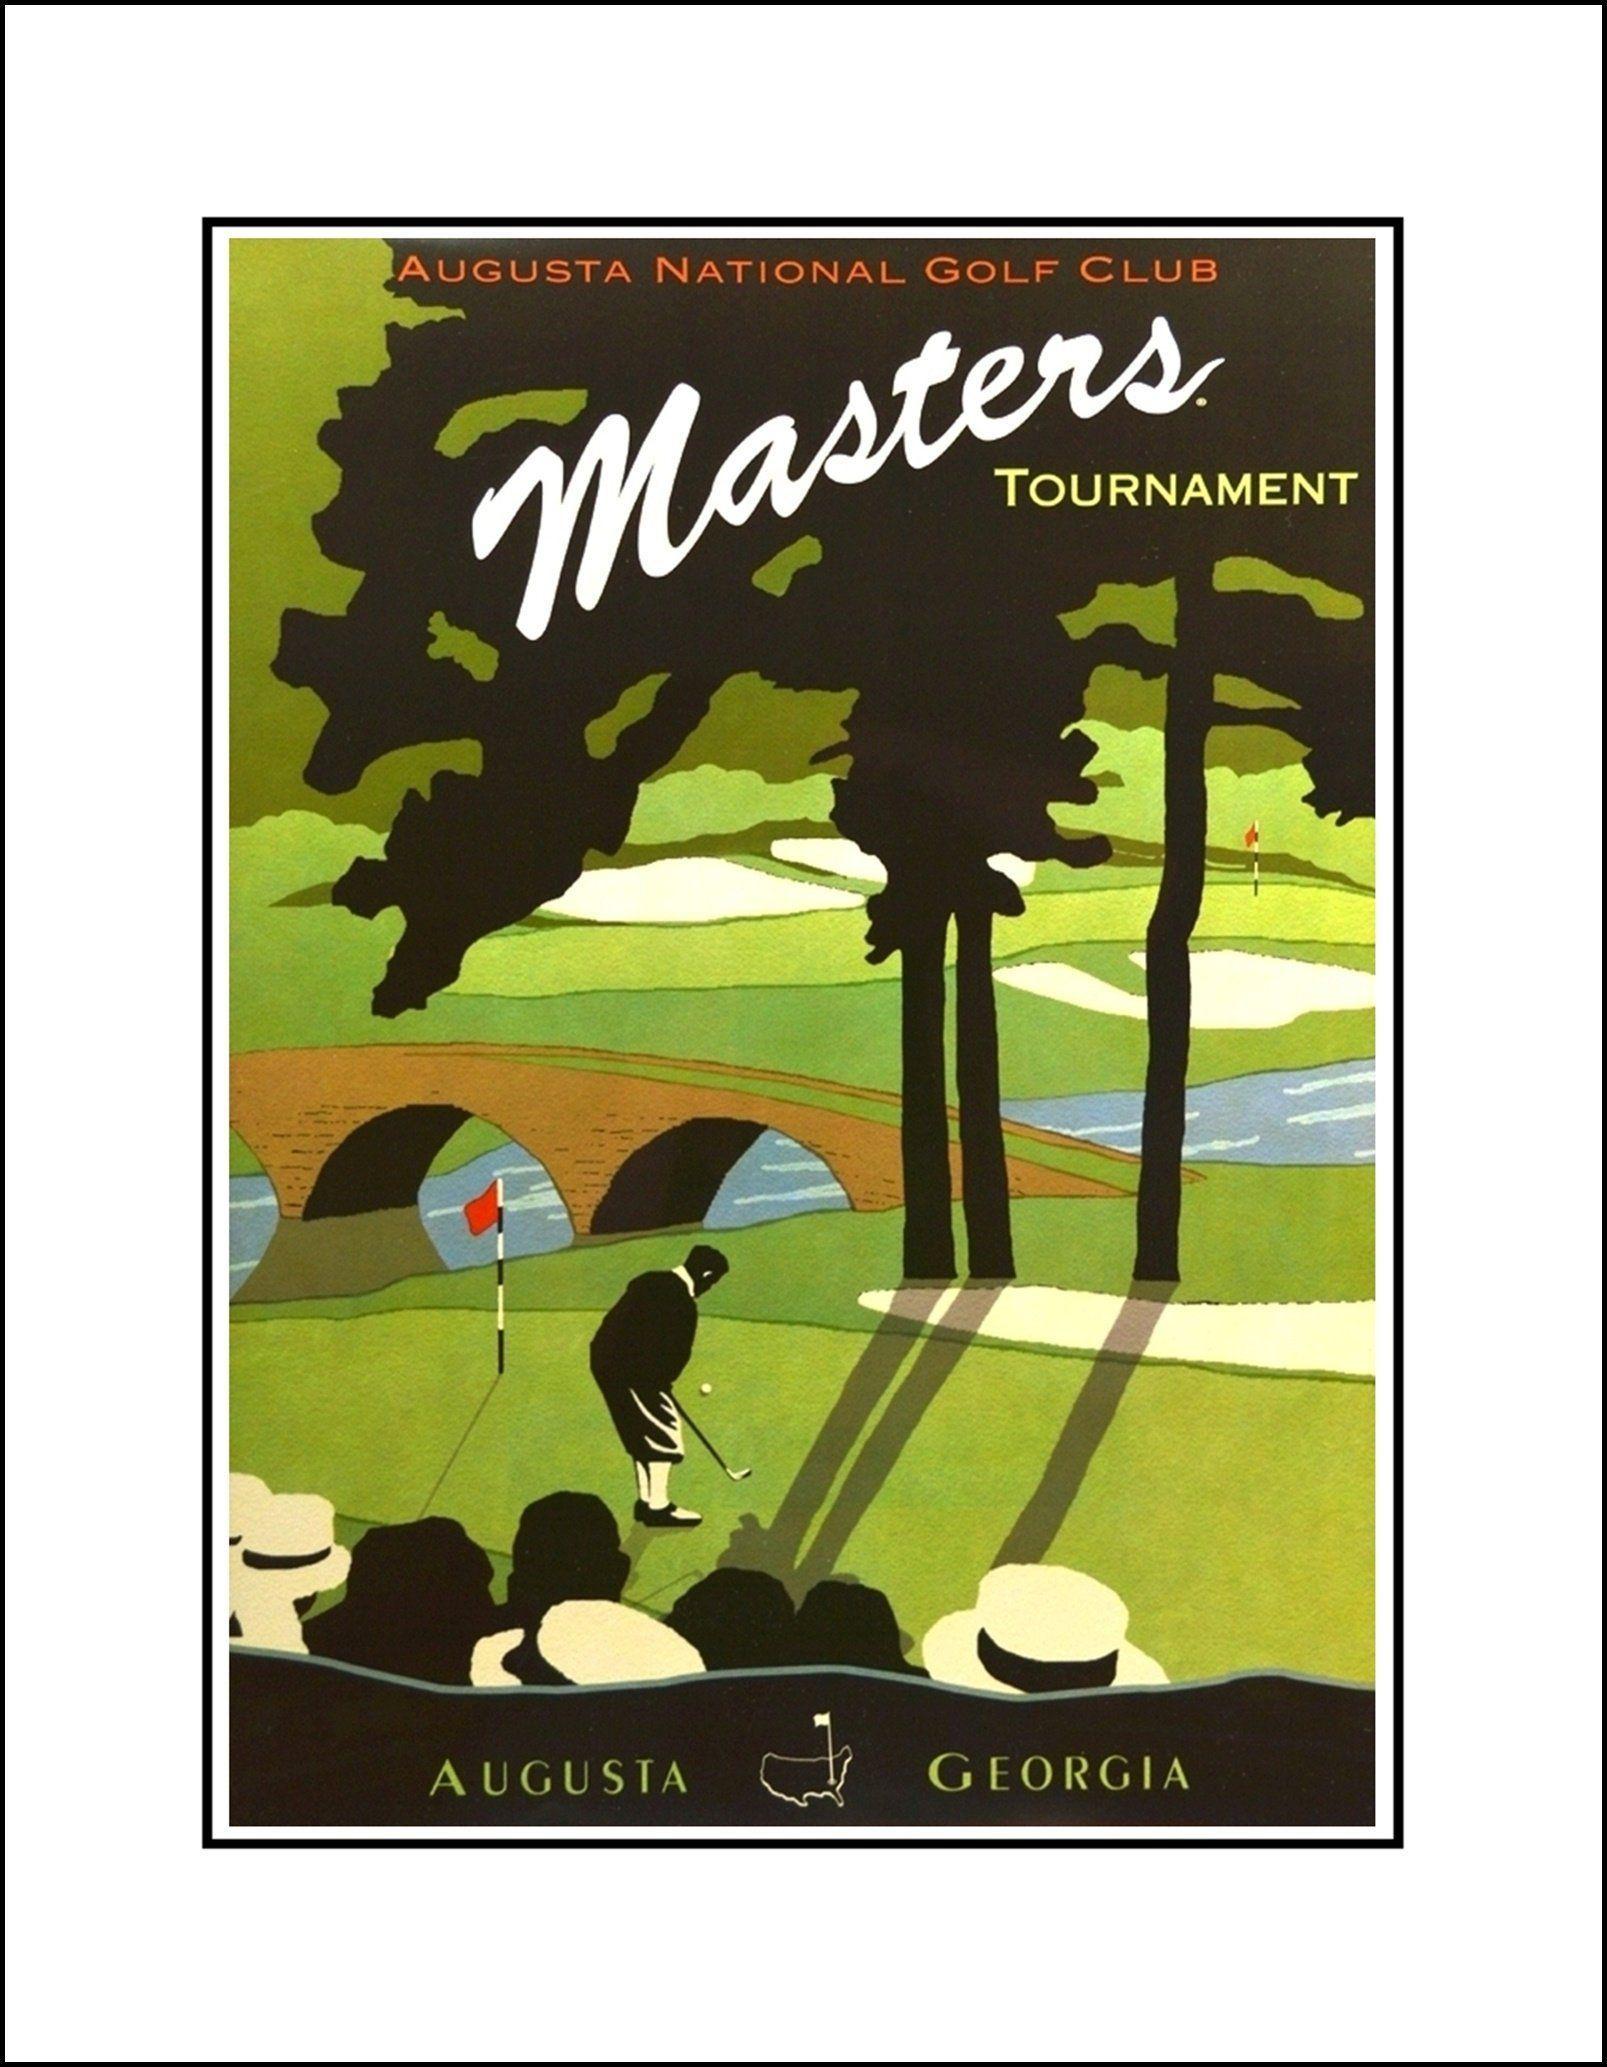 Vintage Masters Golf Illustration Wall Art Office Poster Mens Art Print Gift For Men Gift For Her Gift For Women Golf Art Golf Poster Illustration Wall Art